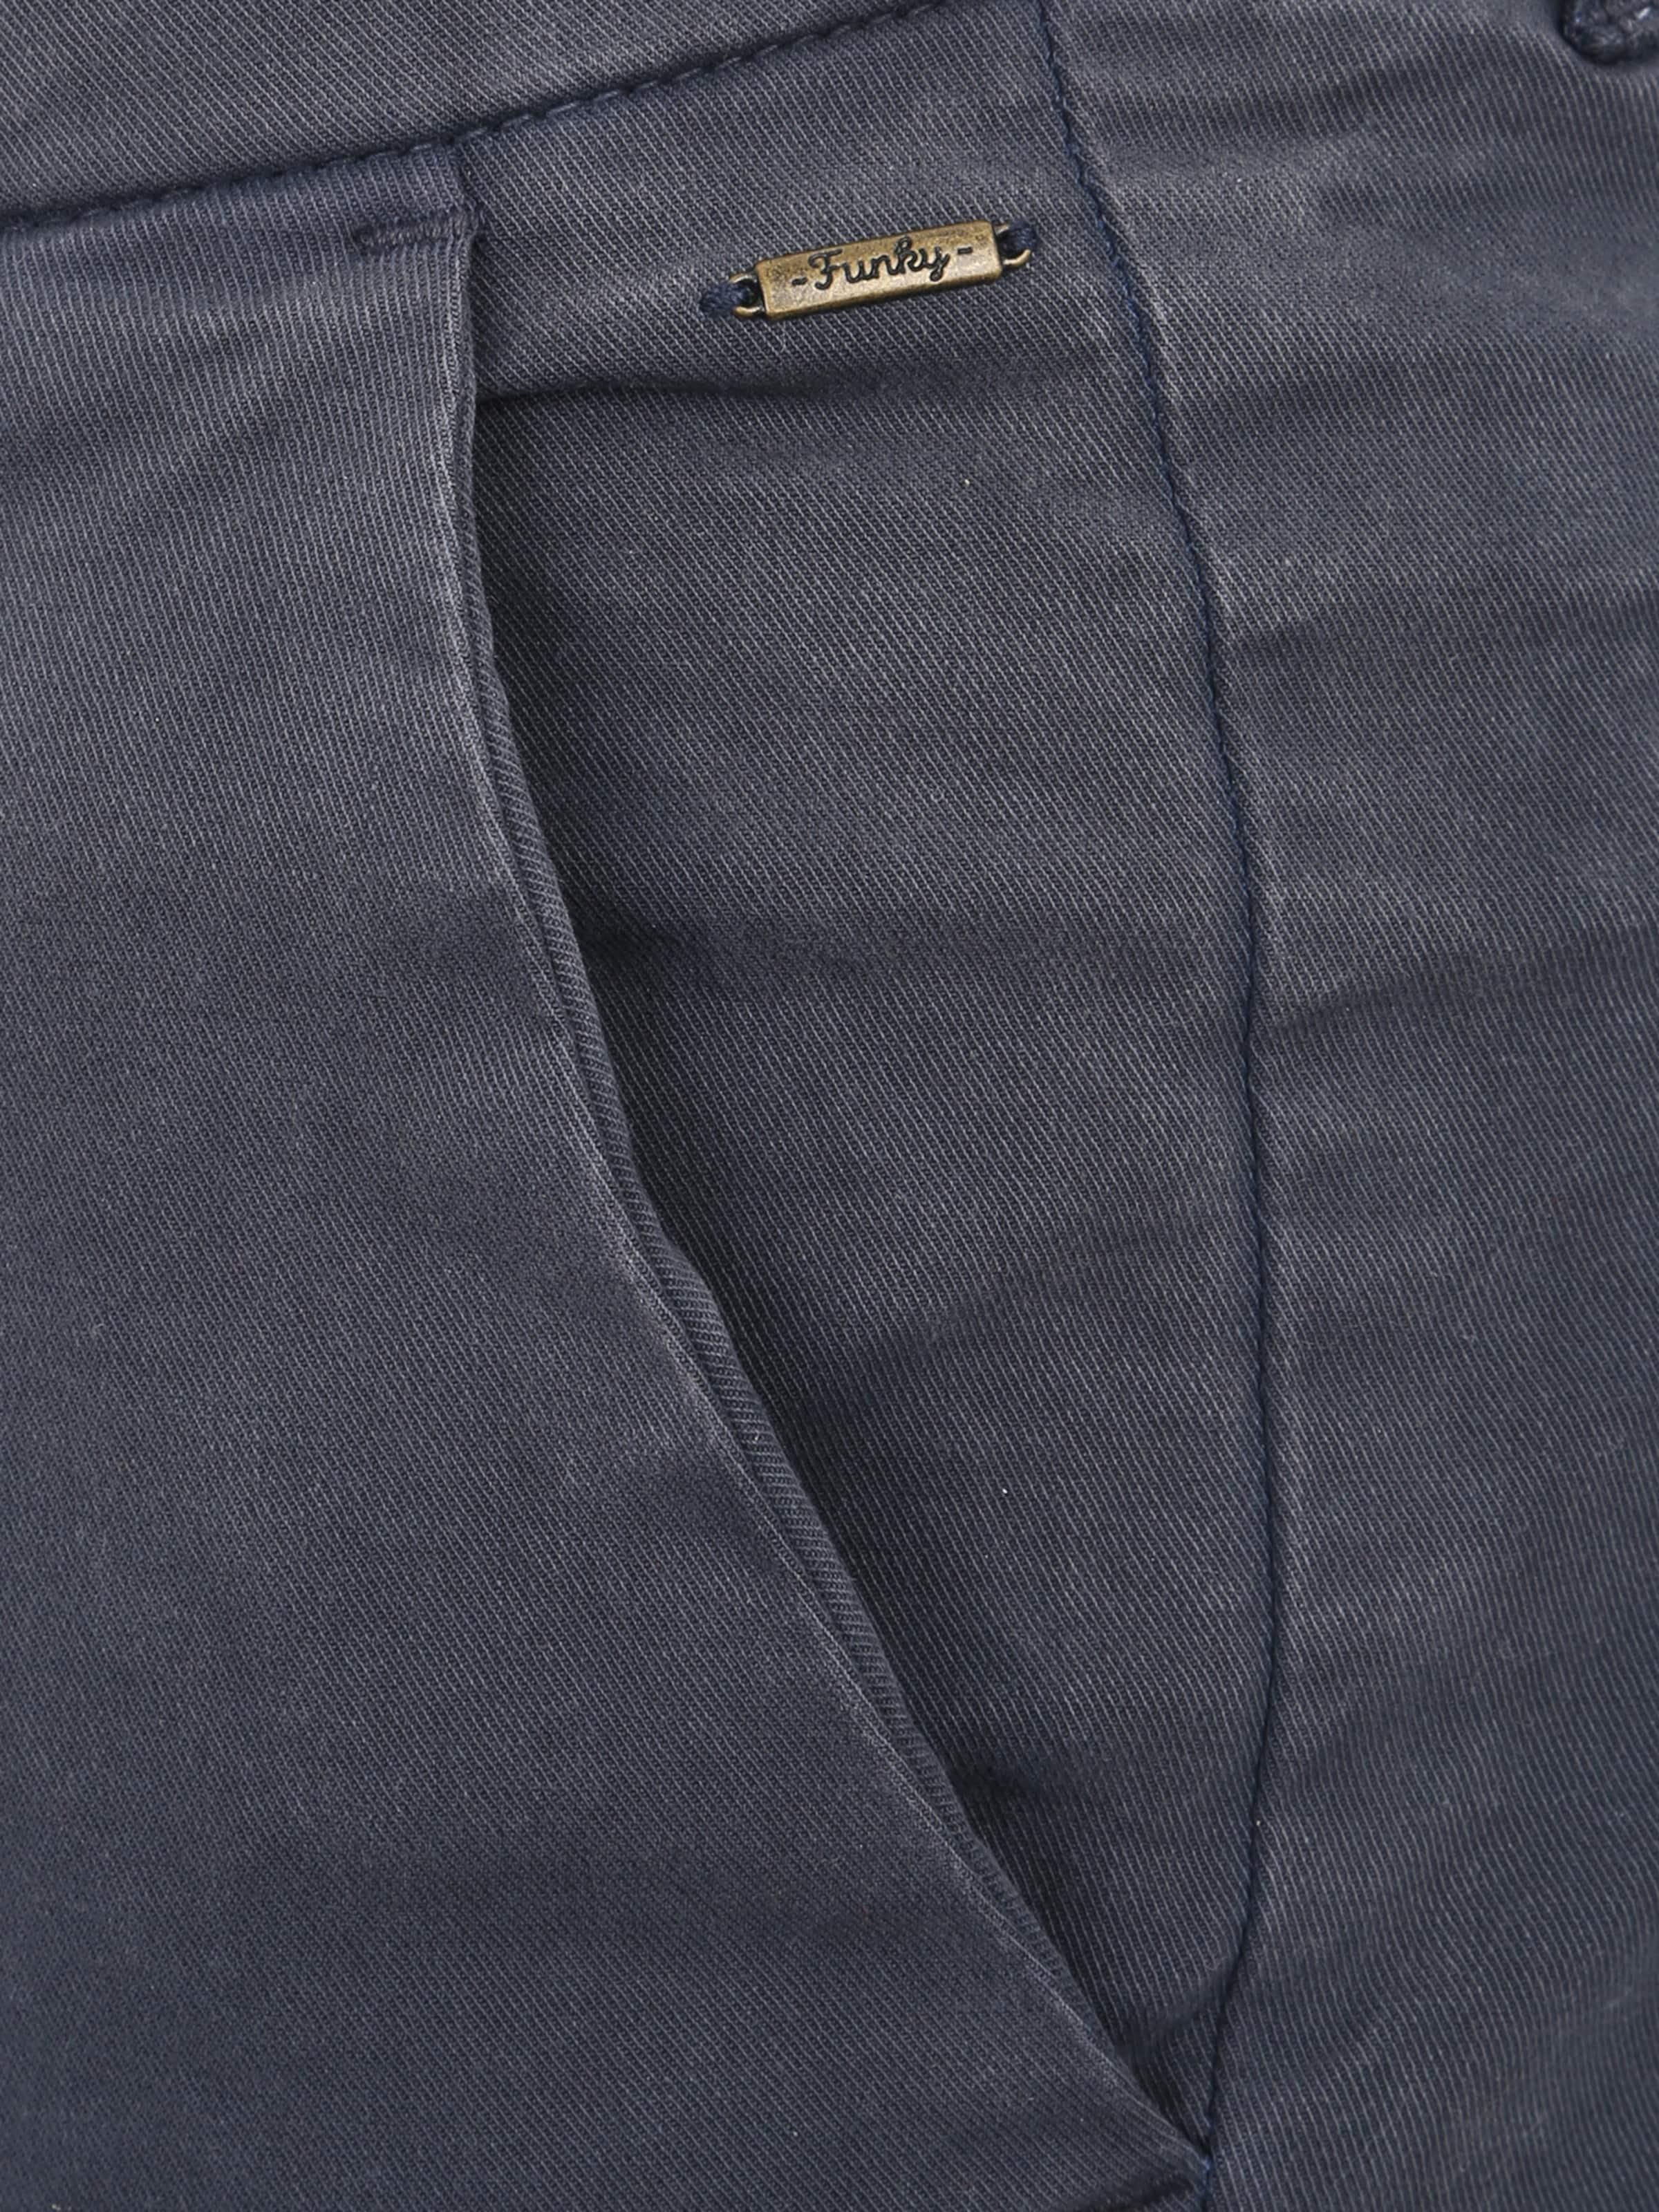 Bleu En Buddha Chino Funky Pantalon Marine m08wvNn